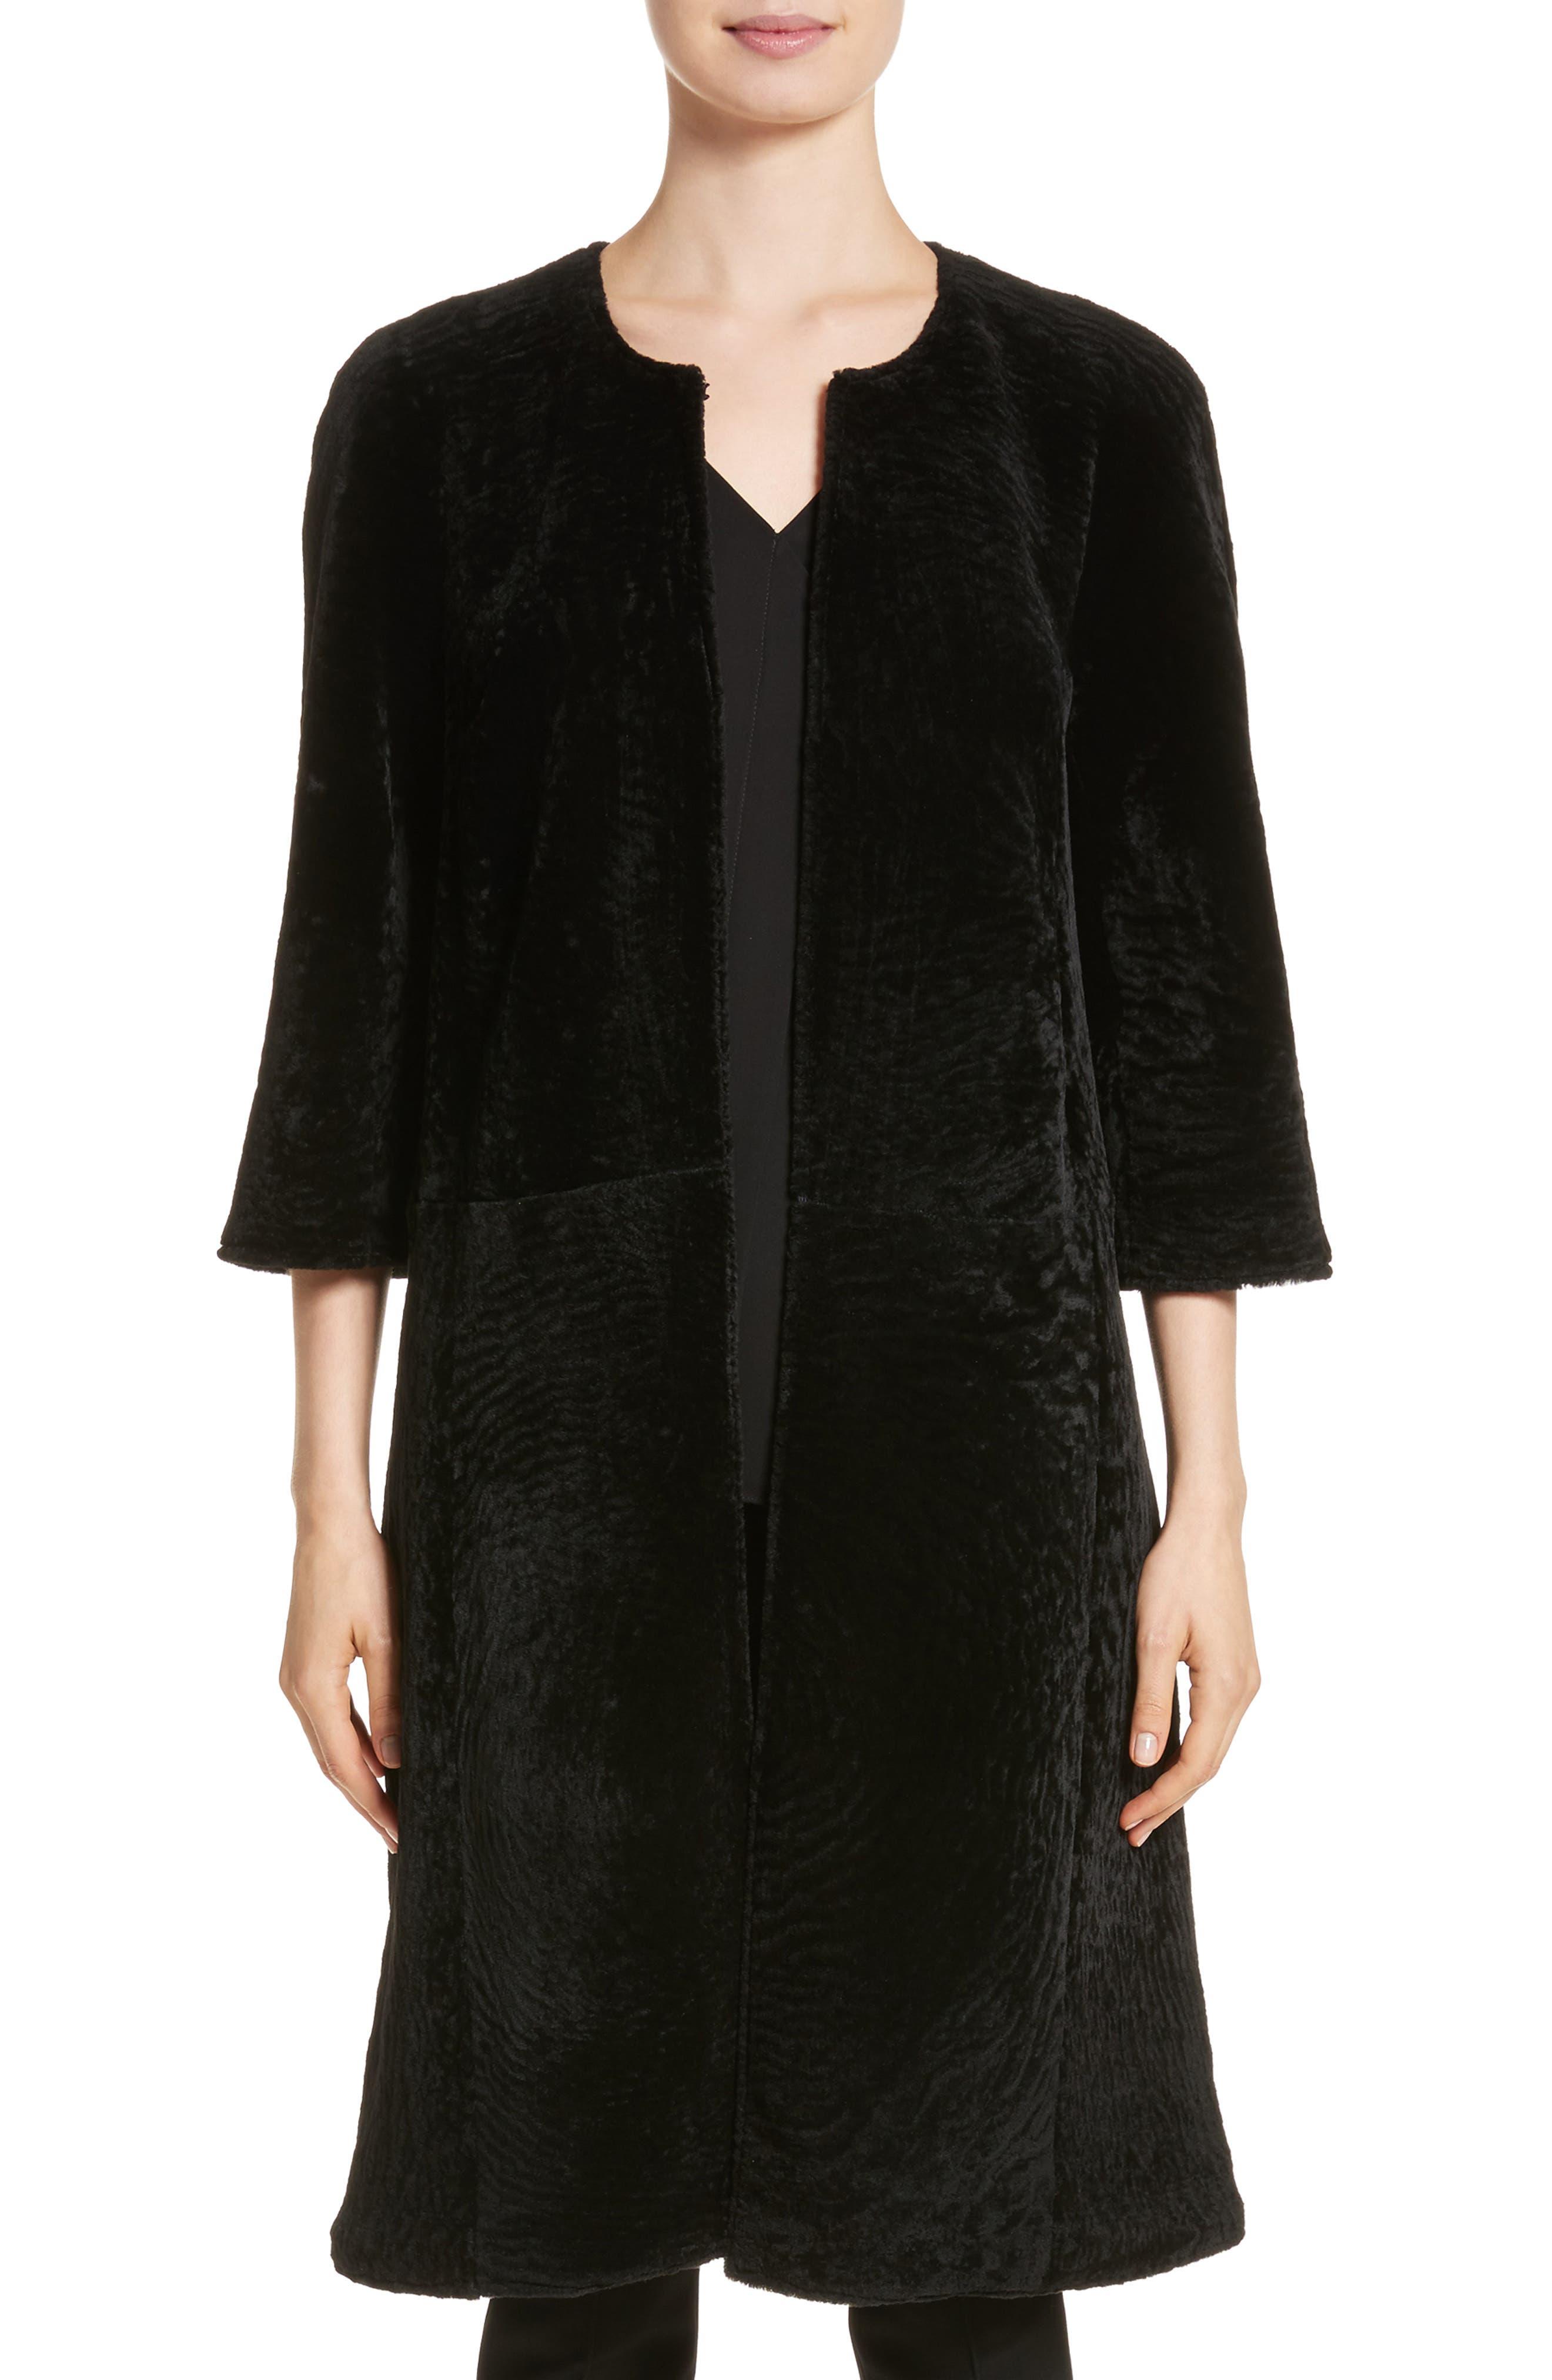 Alternate Image 1 Selected - St. John Collection Genuine Textured Lamb Fur Jacket